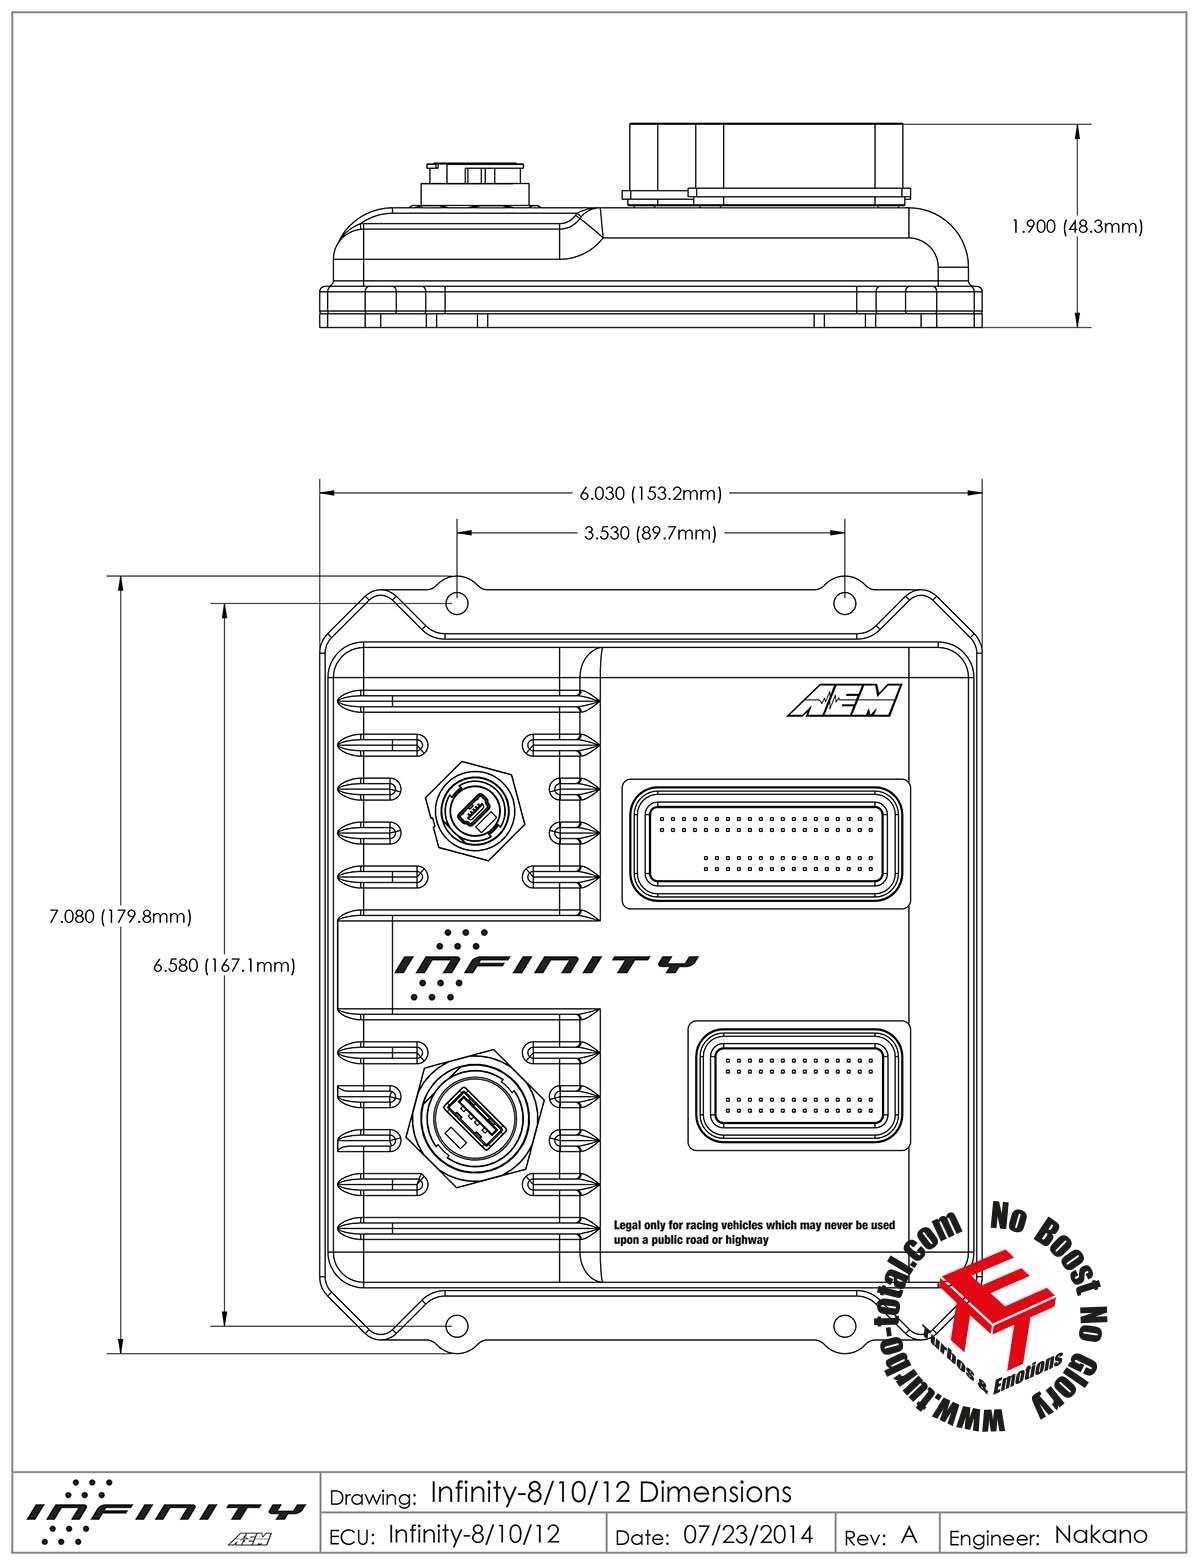 AEM Infinity 712 - Frei Programmierbares Steuergerät 30-7111 ... on